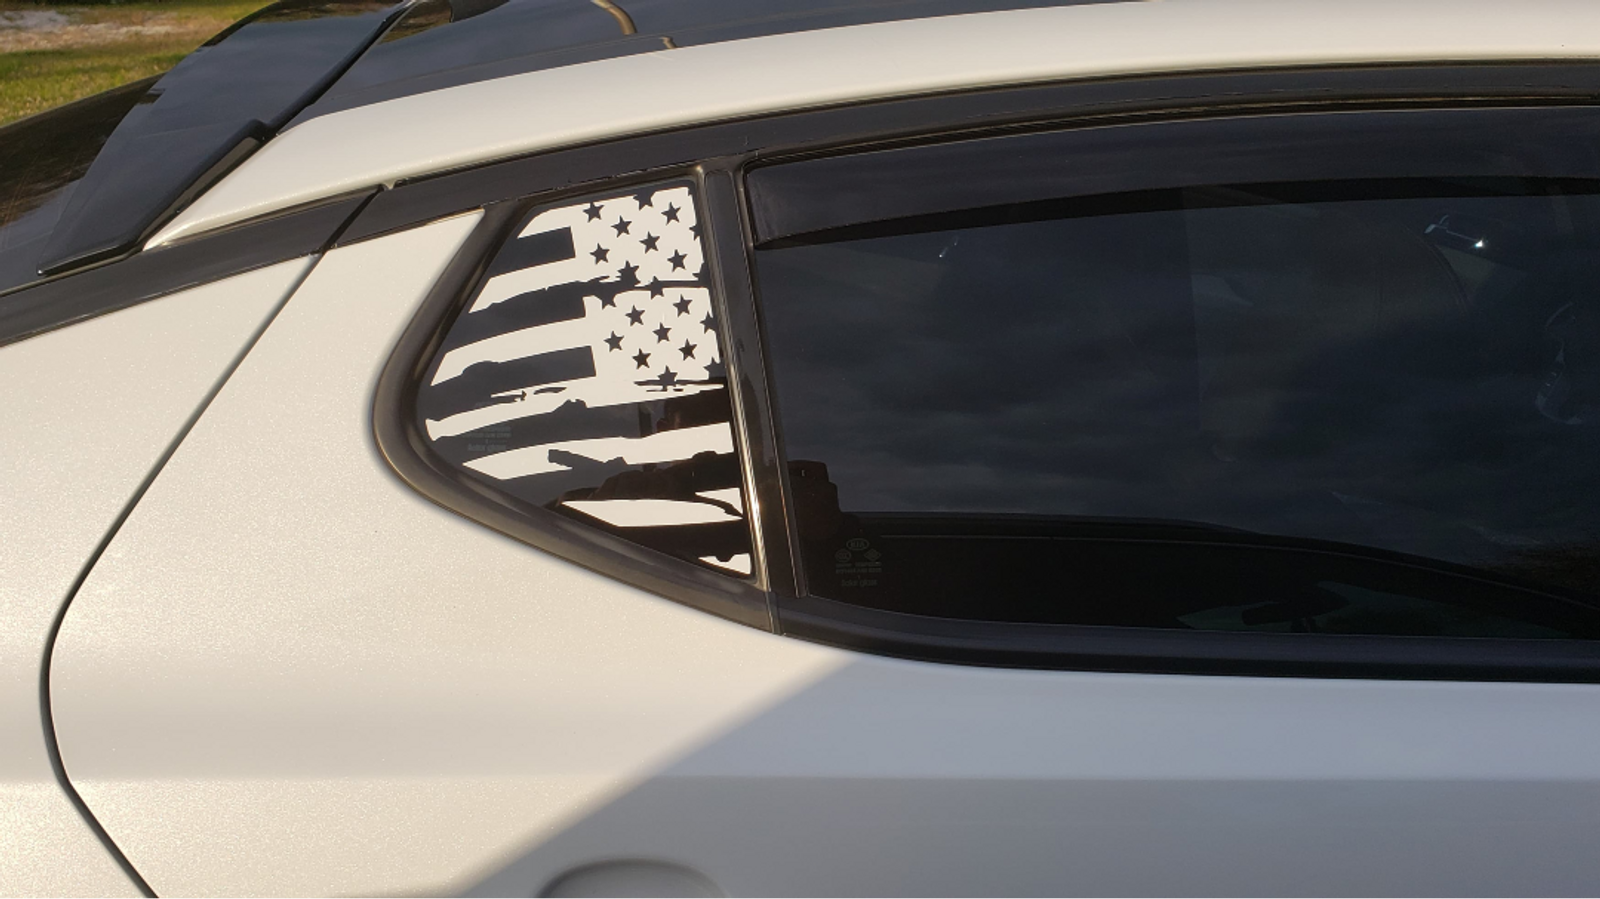 KIA Optima with American Flag Decal